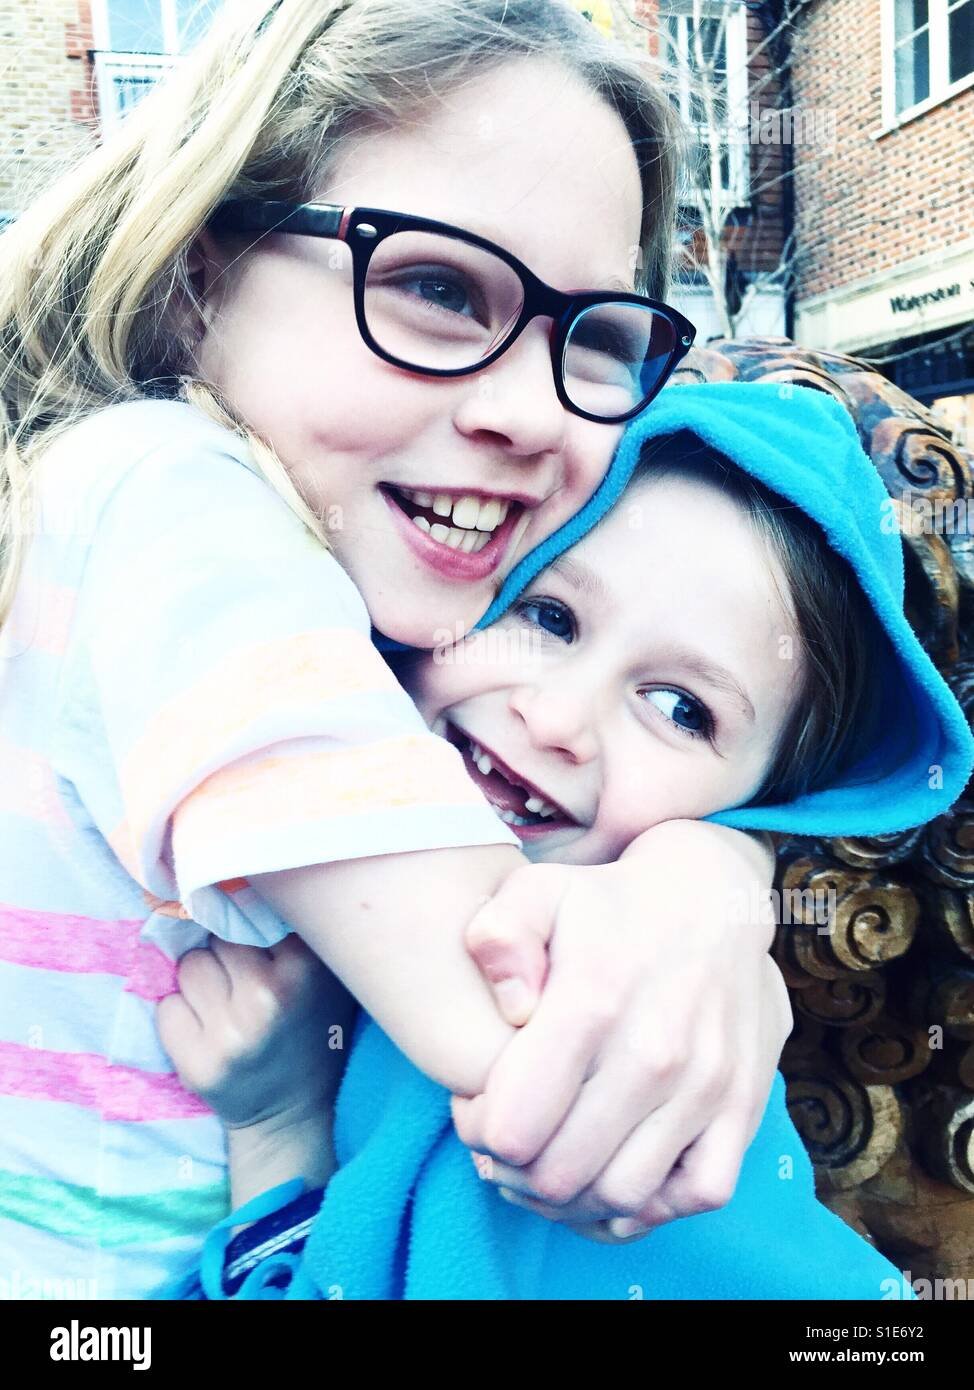 Sisters cuddling - Stock Image